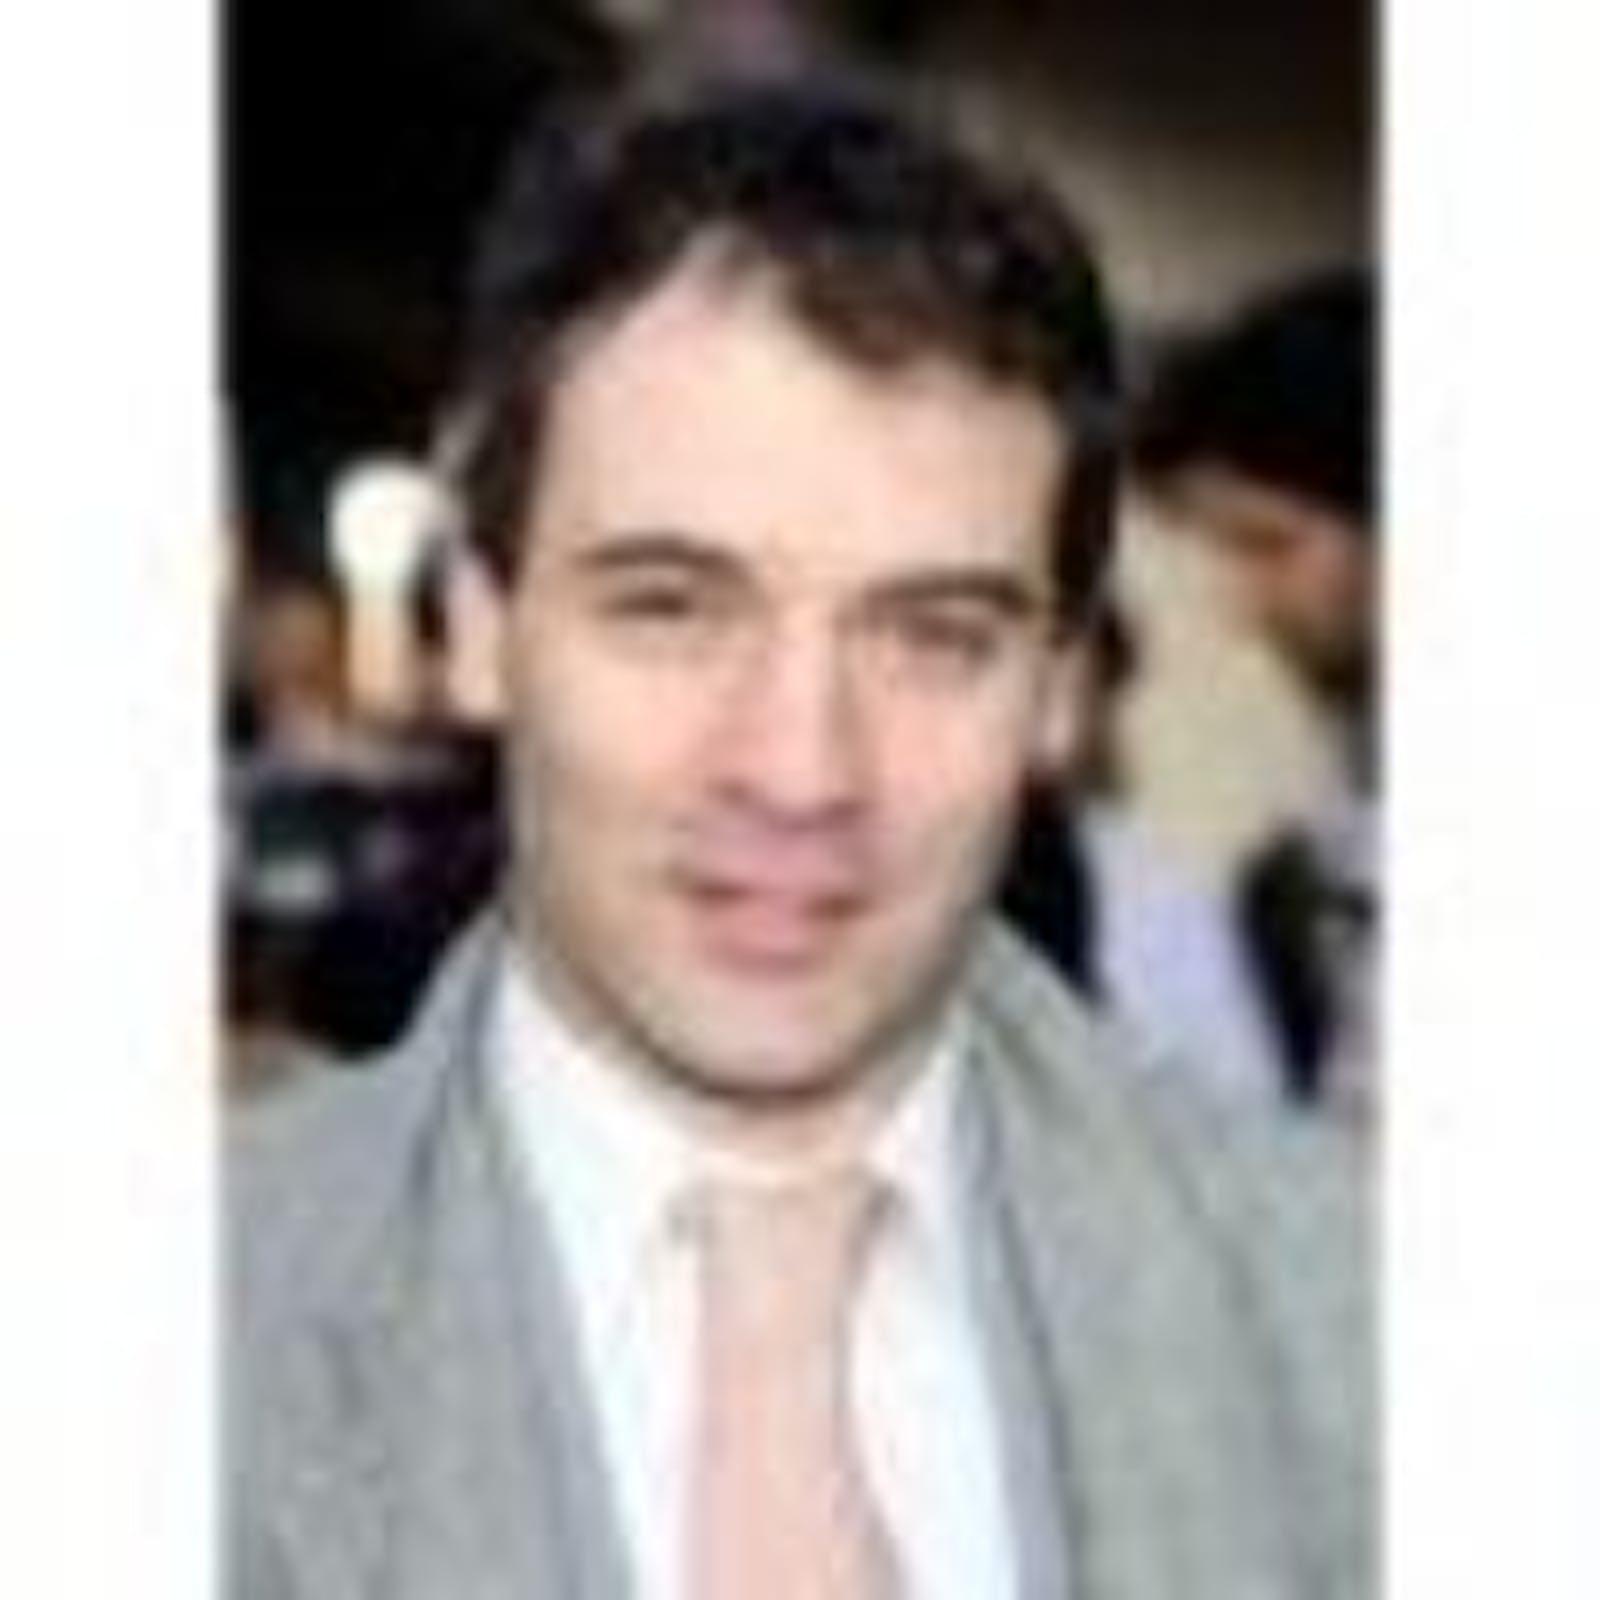 Josh Appignanesi